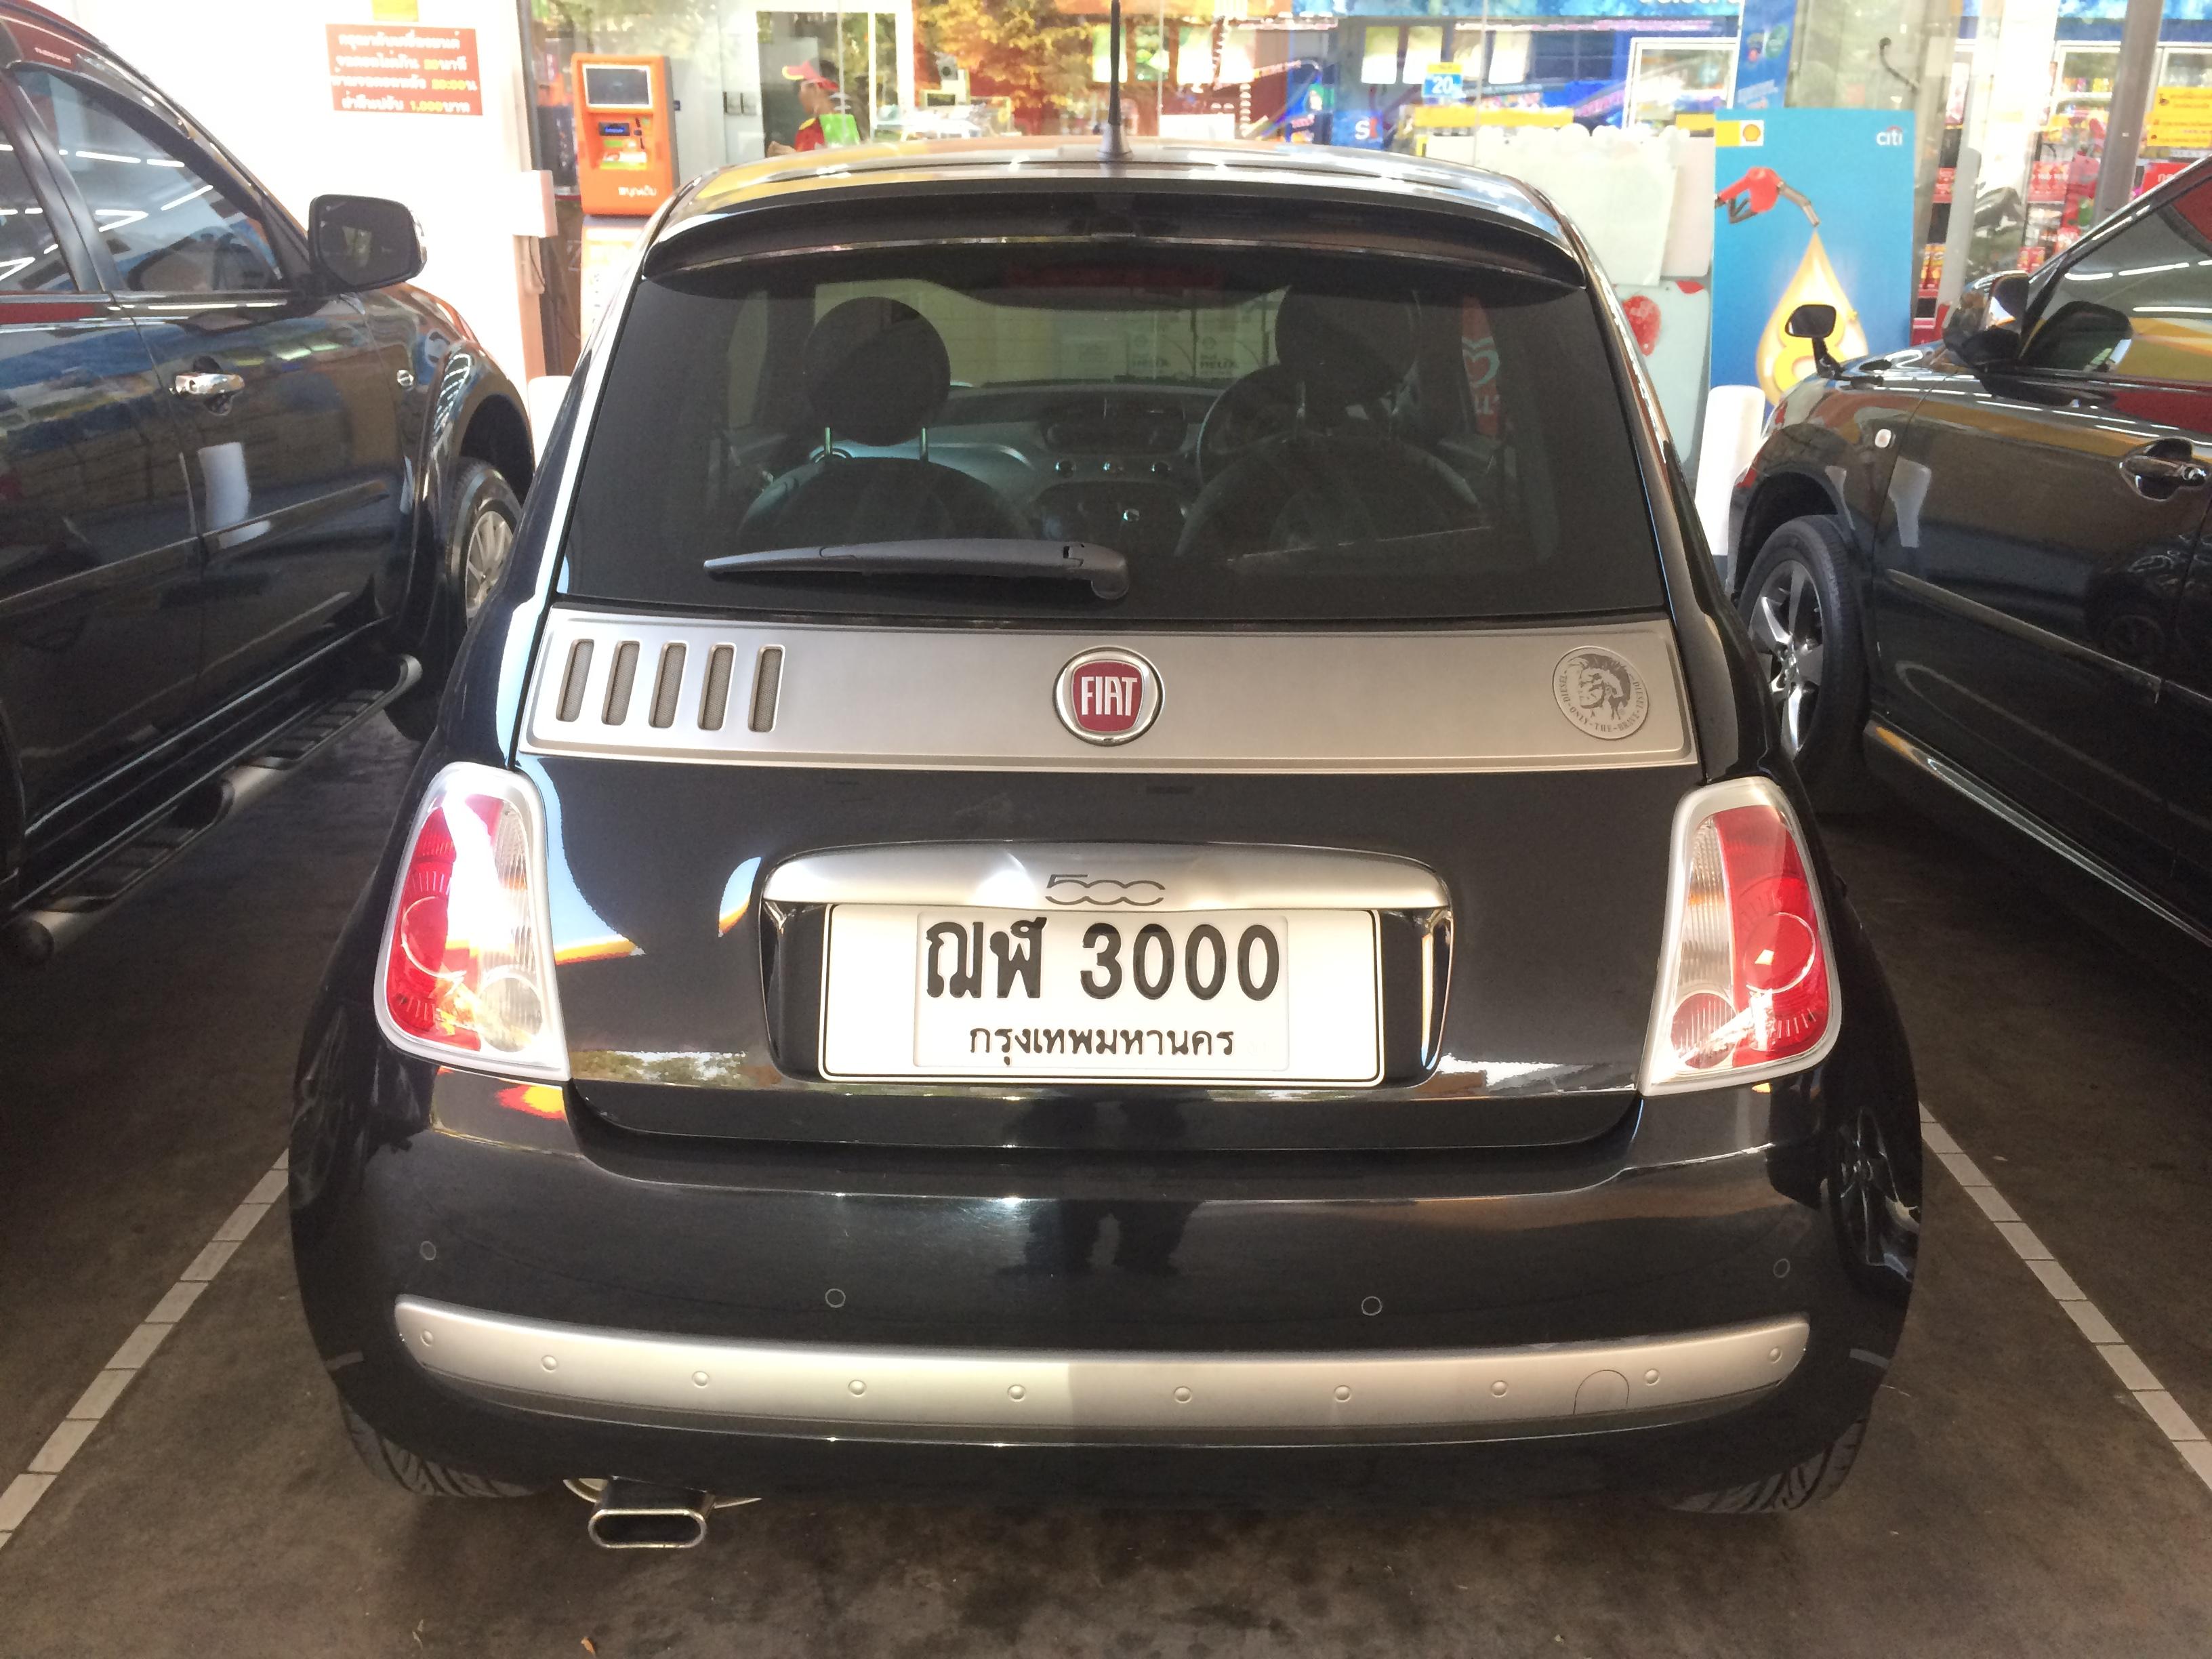 File 2008 Fiat 500 312 By Diesel Hatchback 14 02 2018 06 Jpg